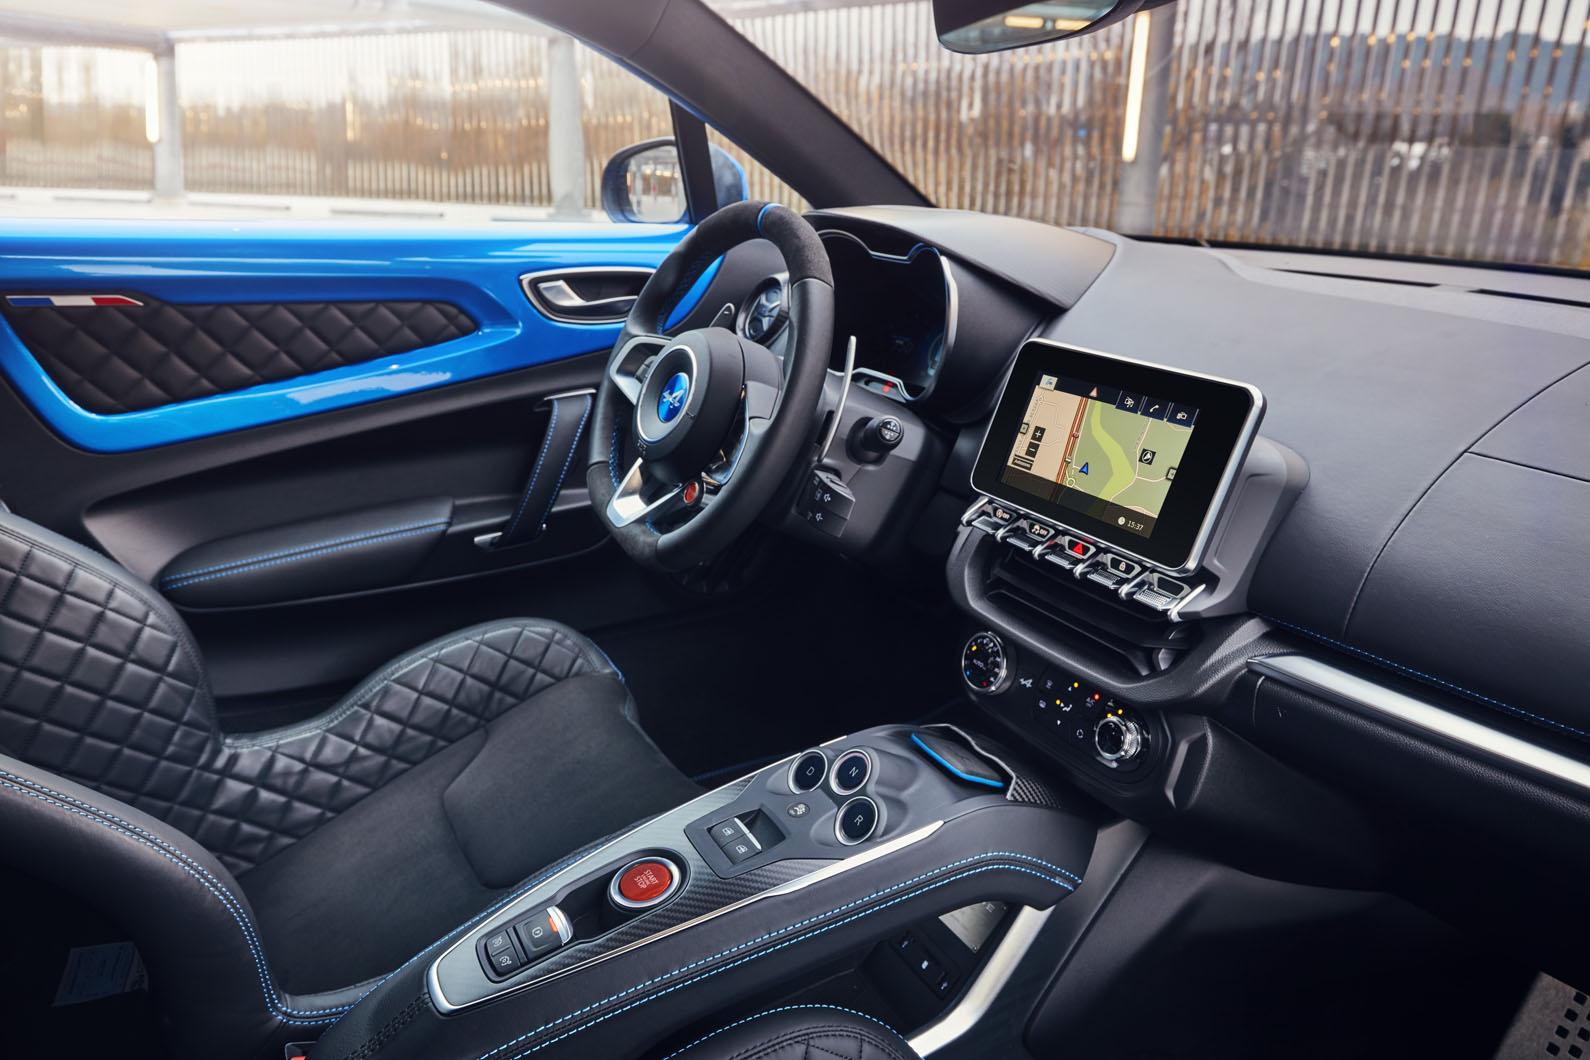 7-alpine-a110-2018-uk-review-dashboard.jpg